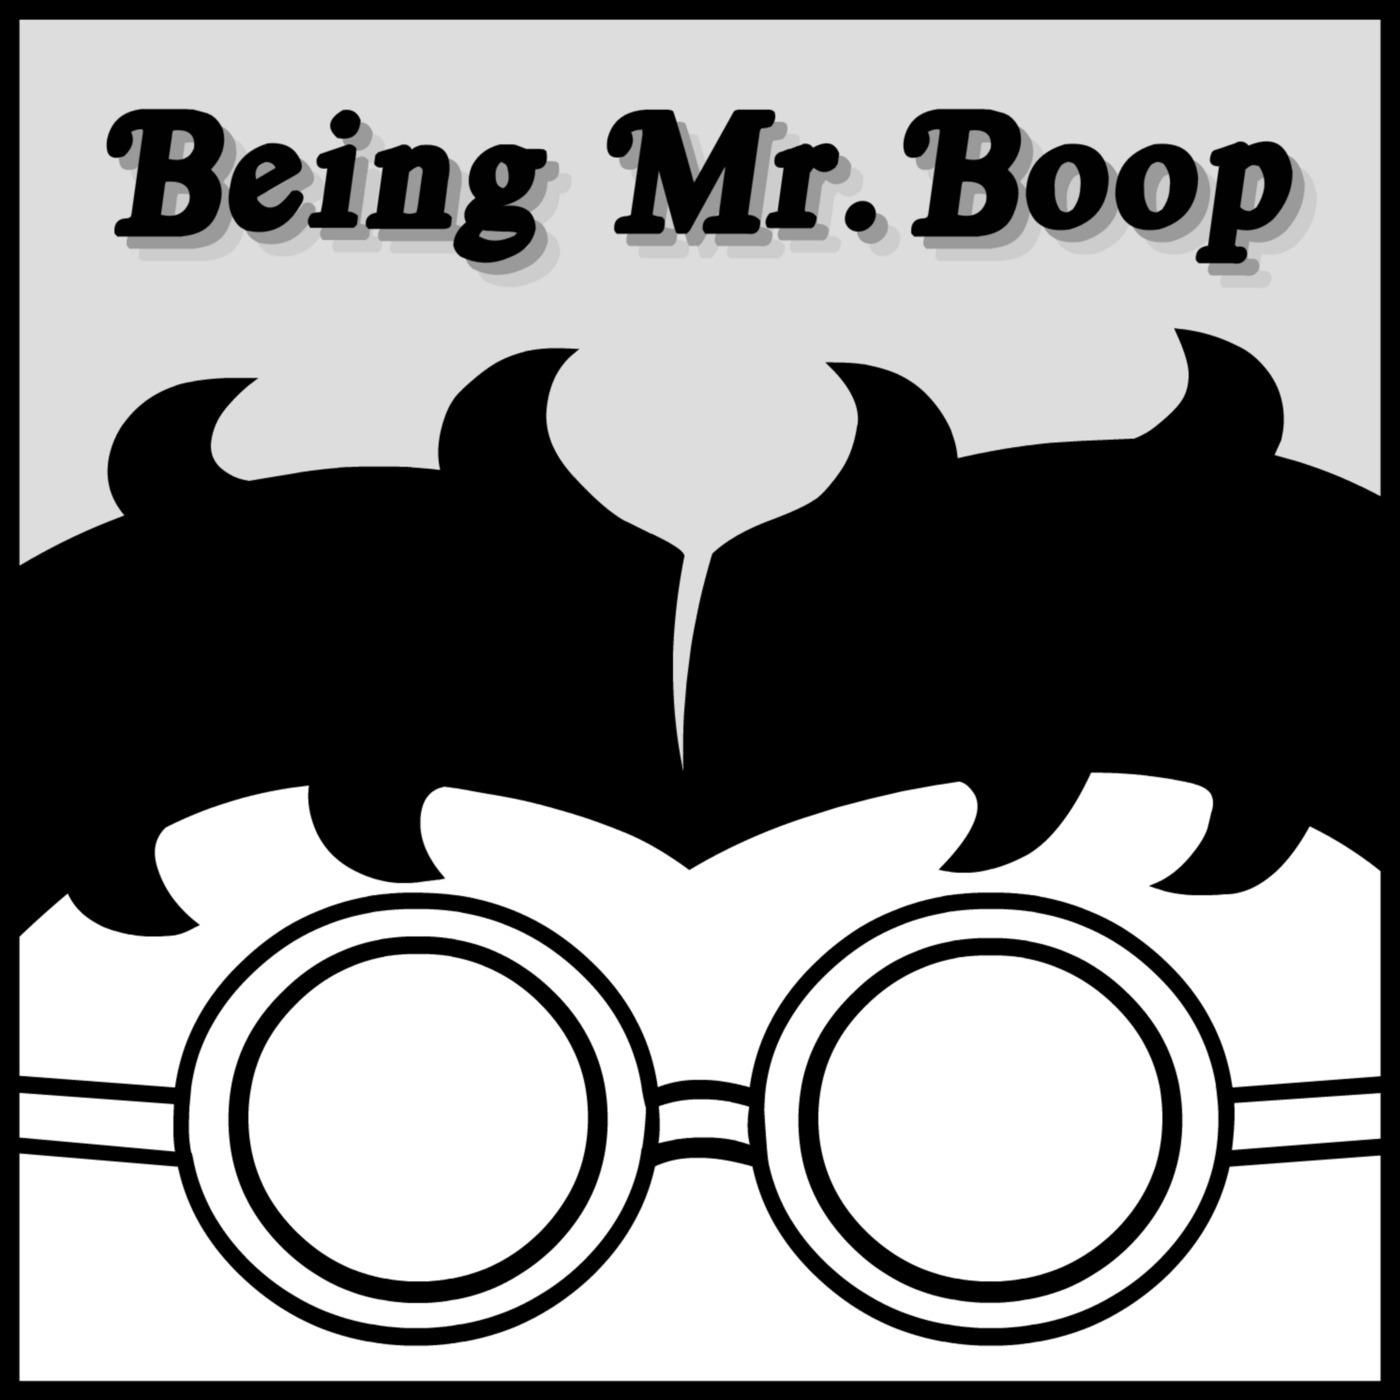 Being Mr. Boop: Episode 5 - Saturday, February 29, 2020 Pt. 3